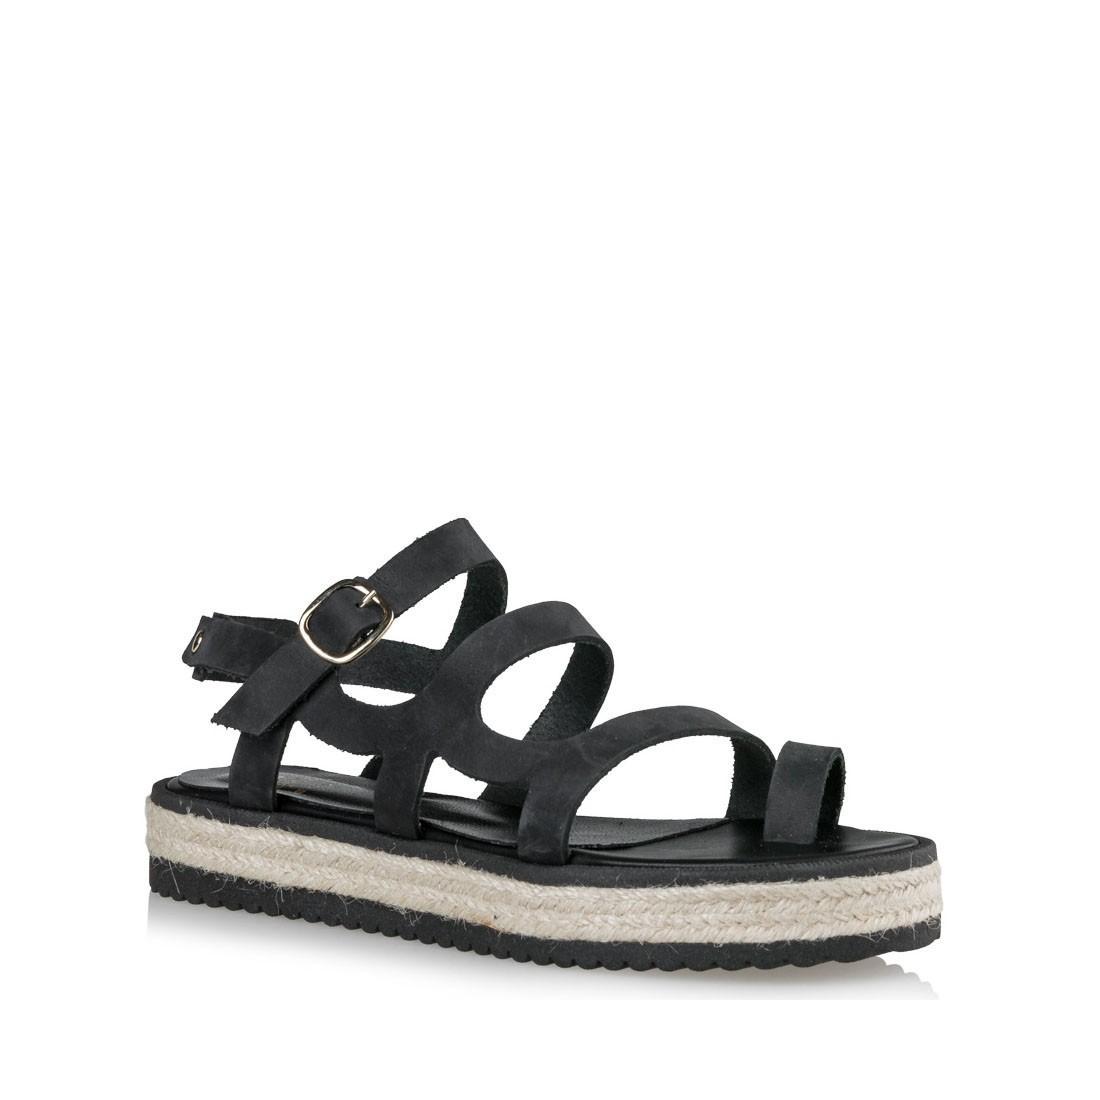 4a31aa96dfc Mairiboo by Envie Shoes Γυναικεία Πέδιλα M03-07552-34 Μαύρο ...